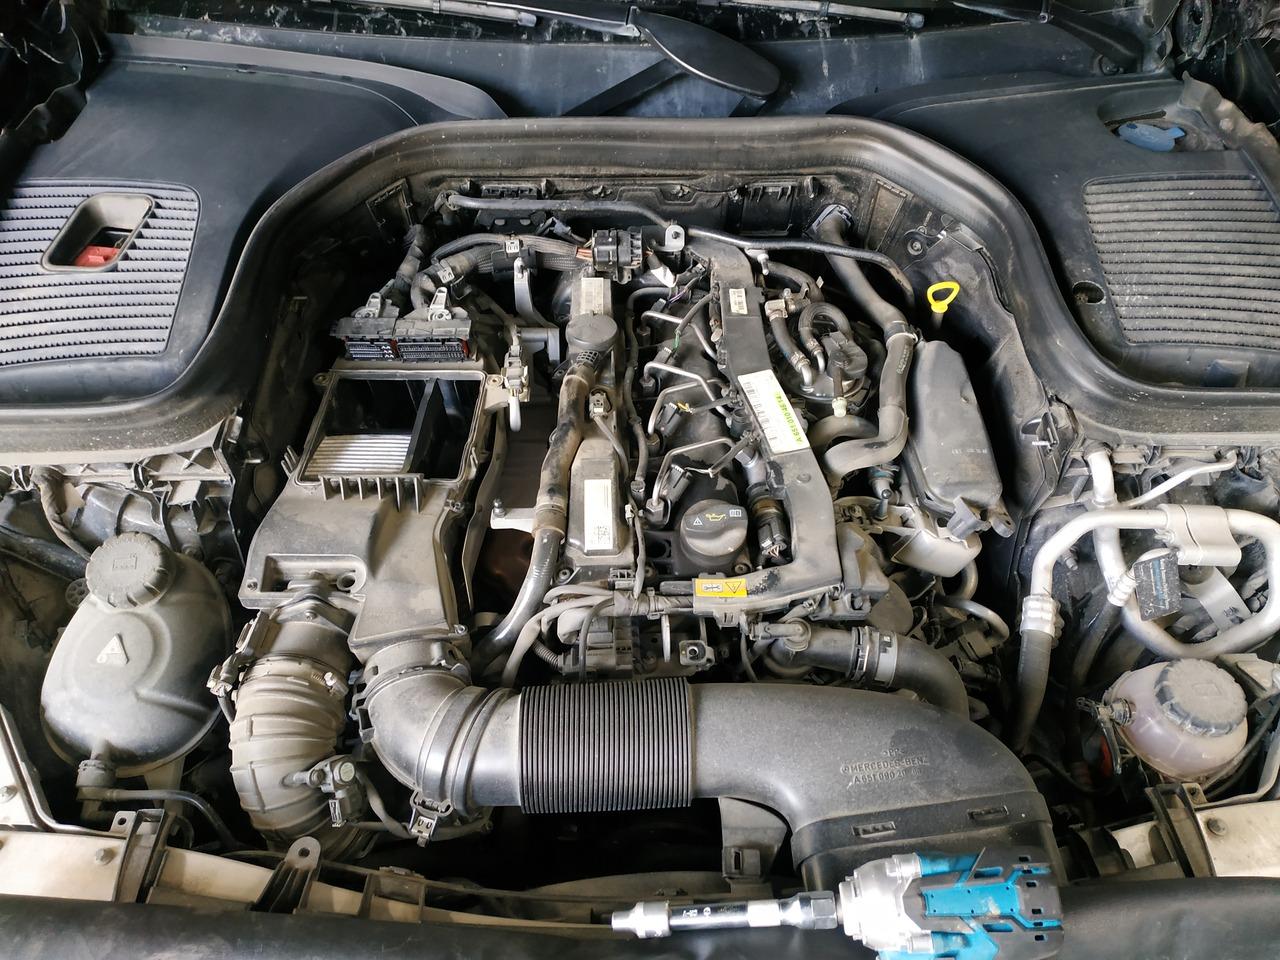 Mercedes Benz GLС 250D, удаление мочевины AdBlue